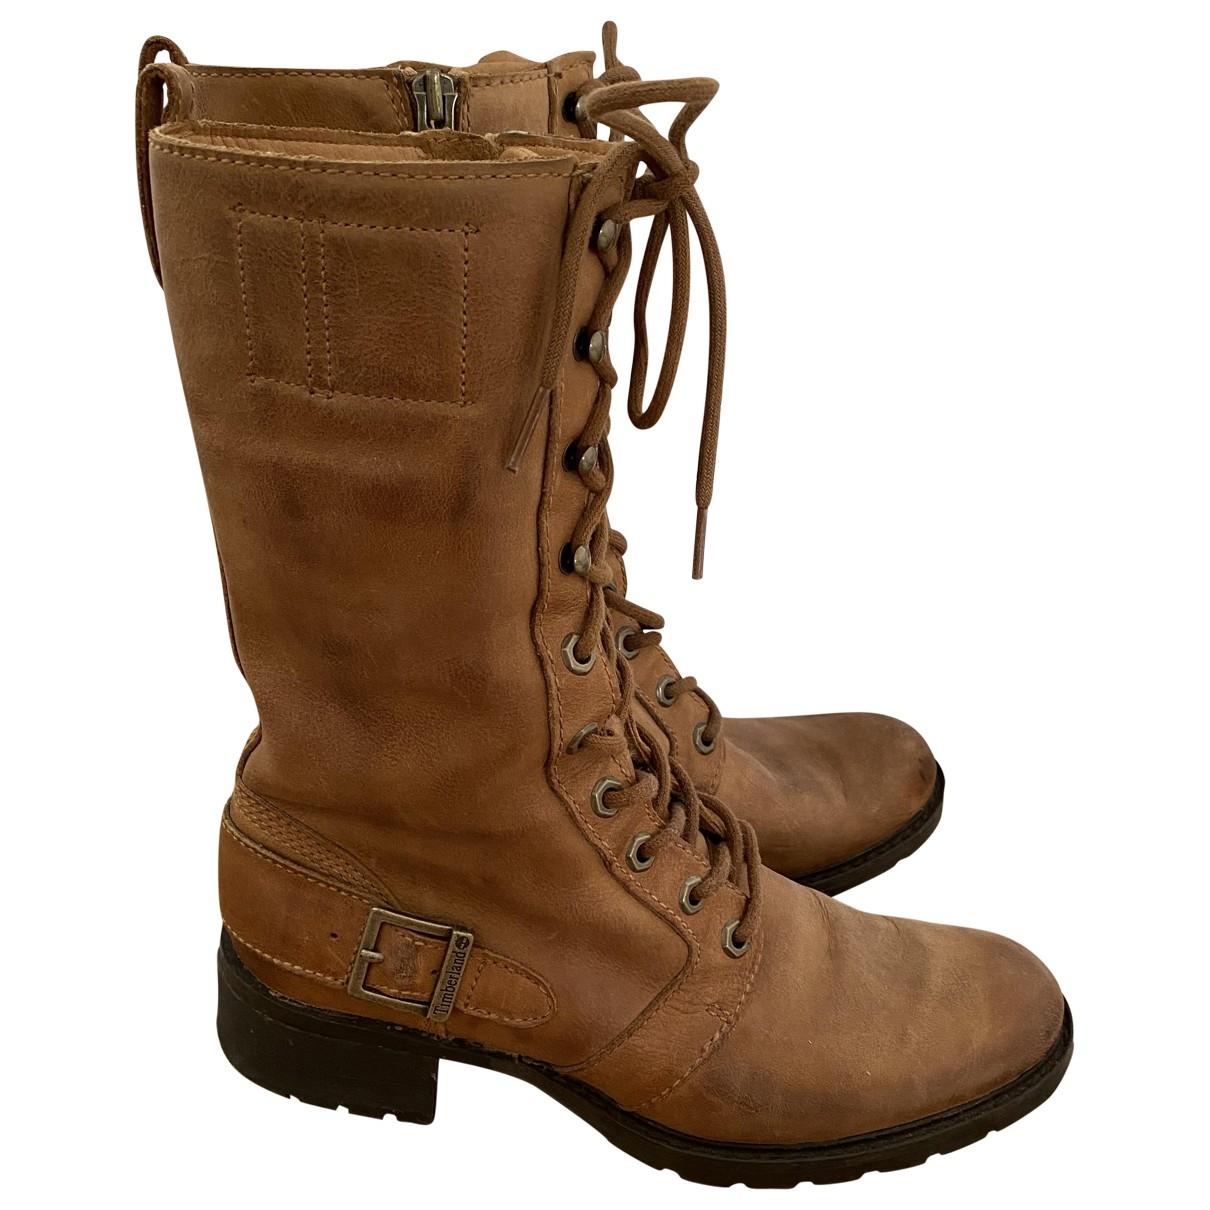 Timberland \N Stiefel in  Beige Leder